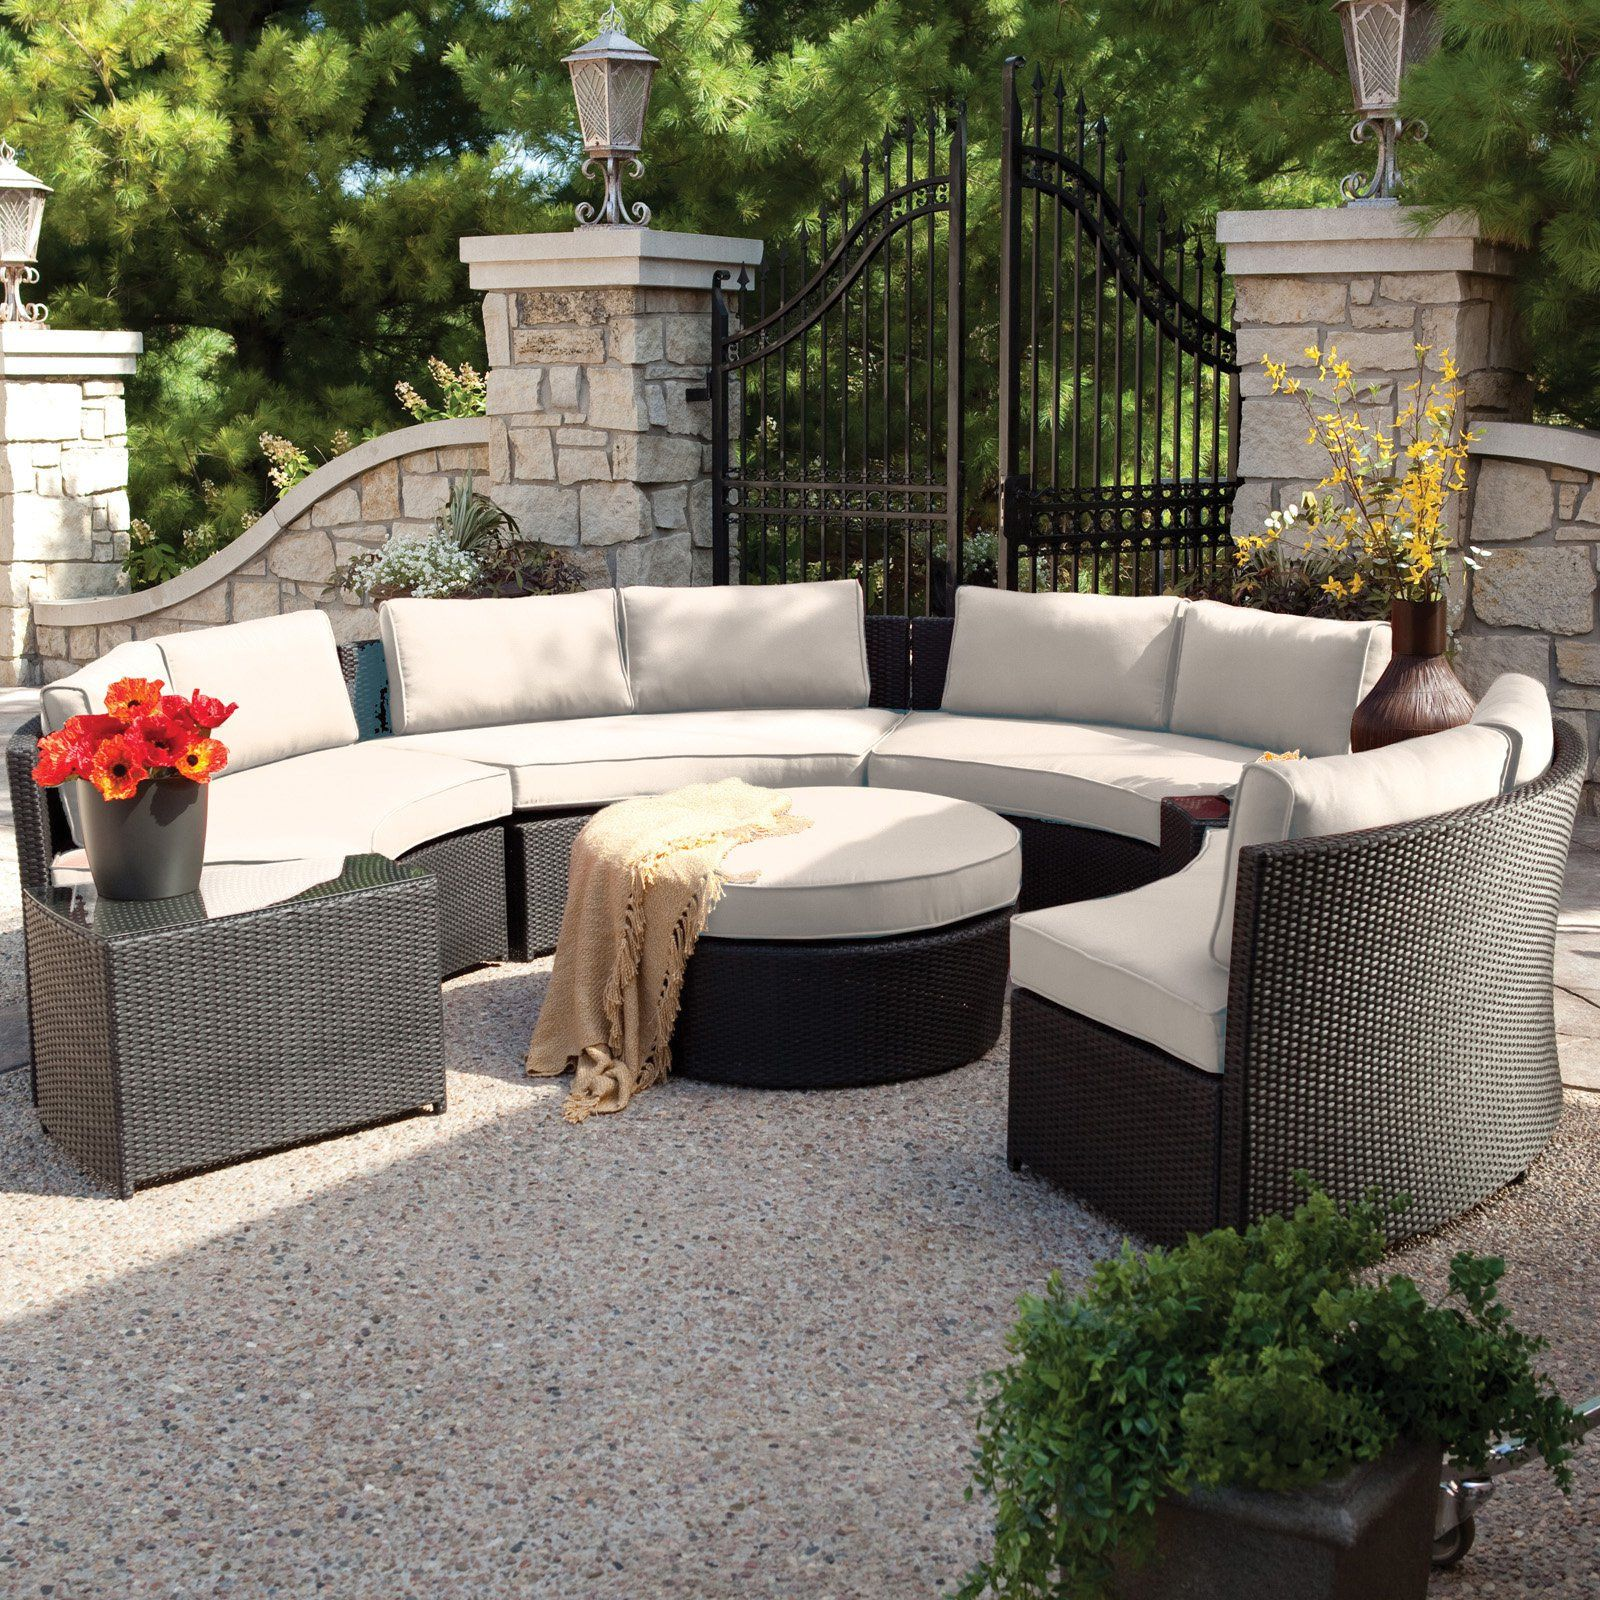 Garden decor kijiji  Circular Outdoor Furniture  Best Furniture Gallery Check more at